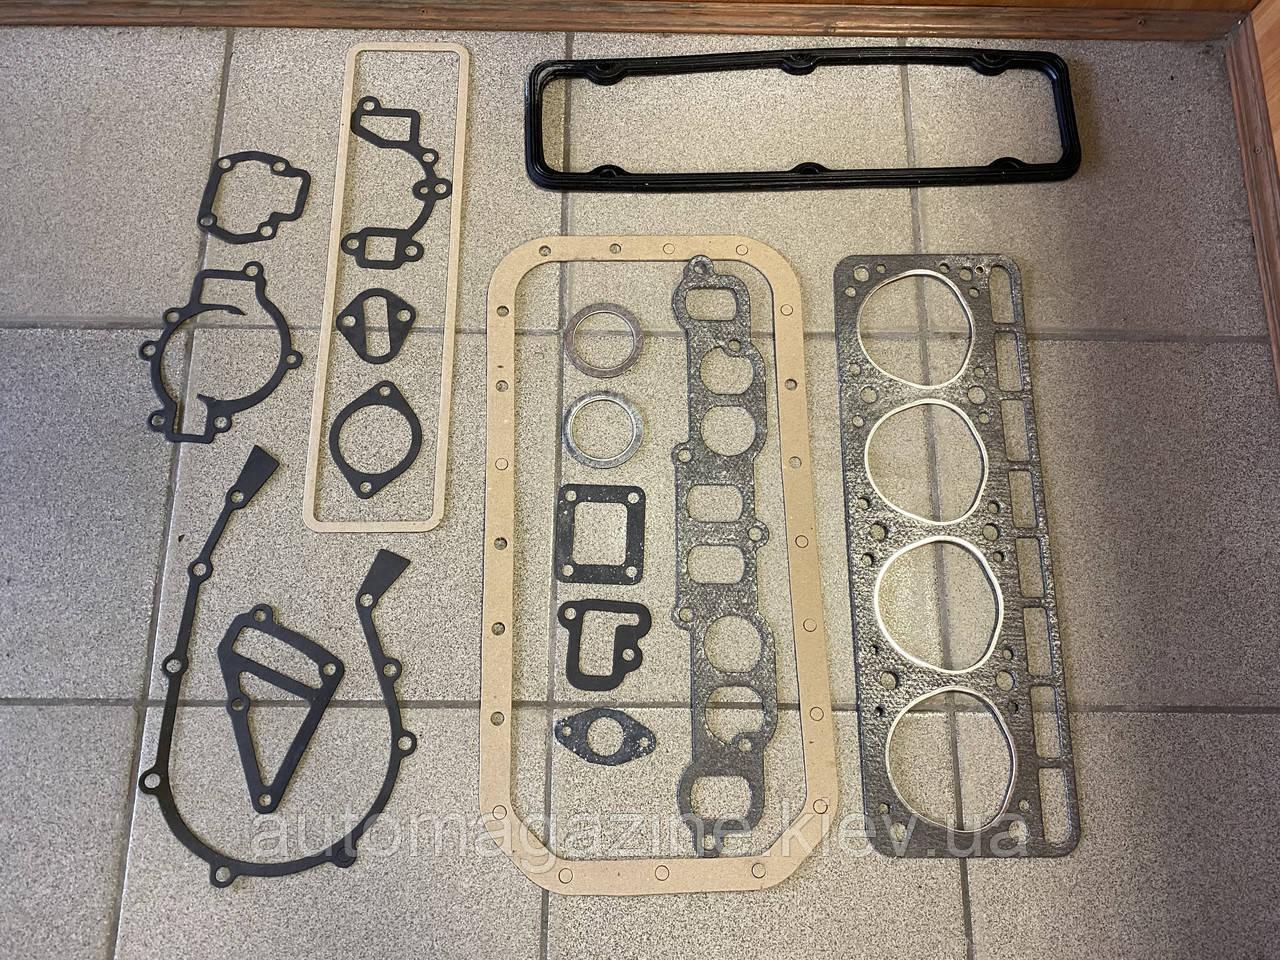 Прокладки двигуна ГАЗ 2410, Газель (402-й двигун)